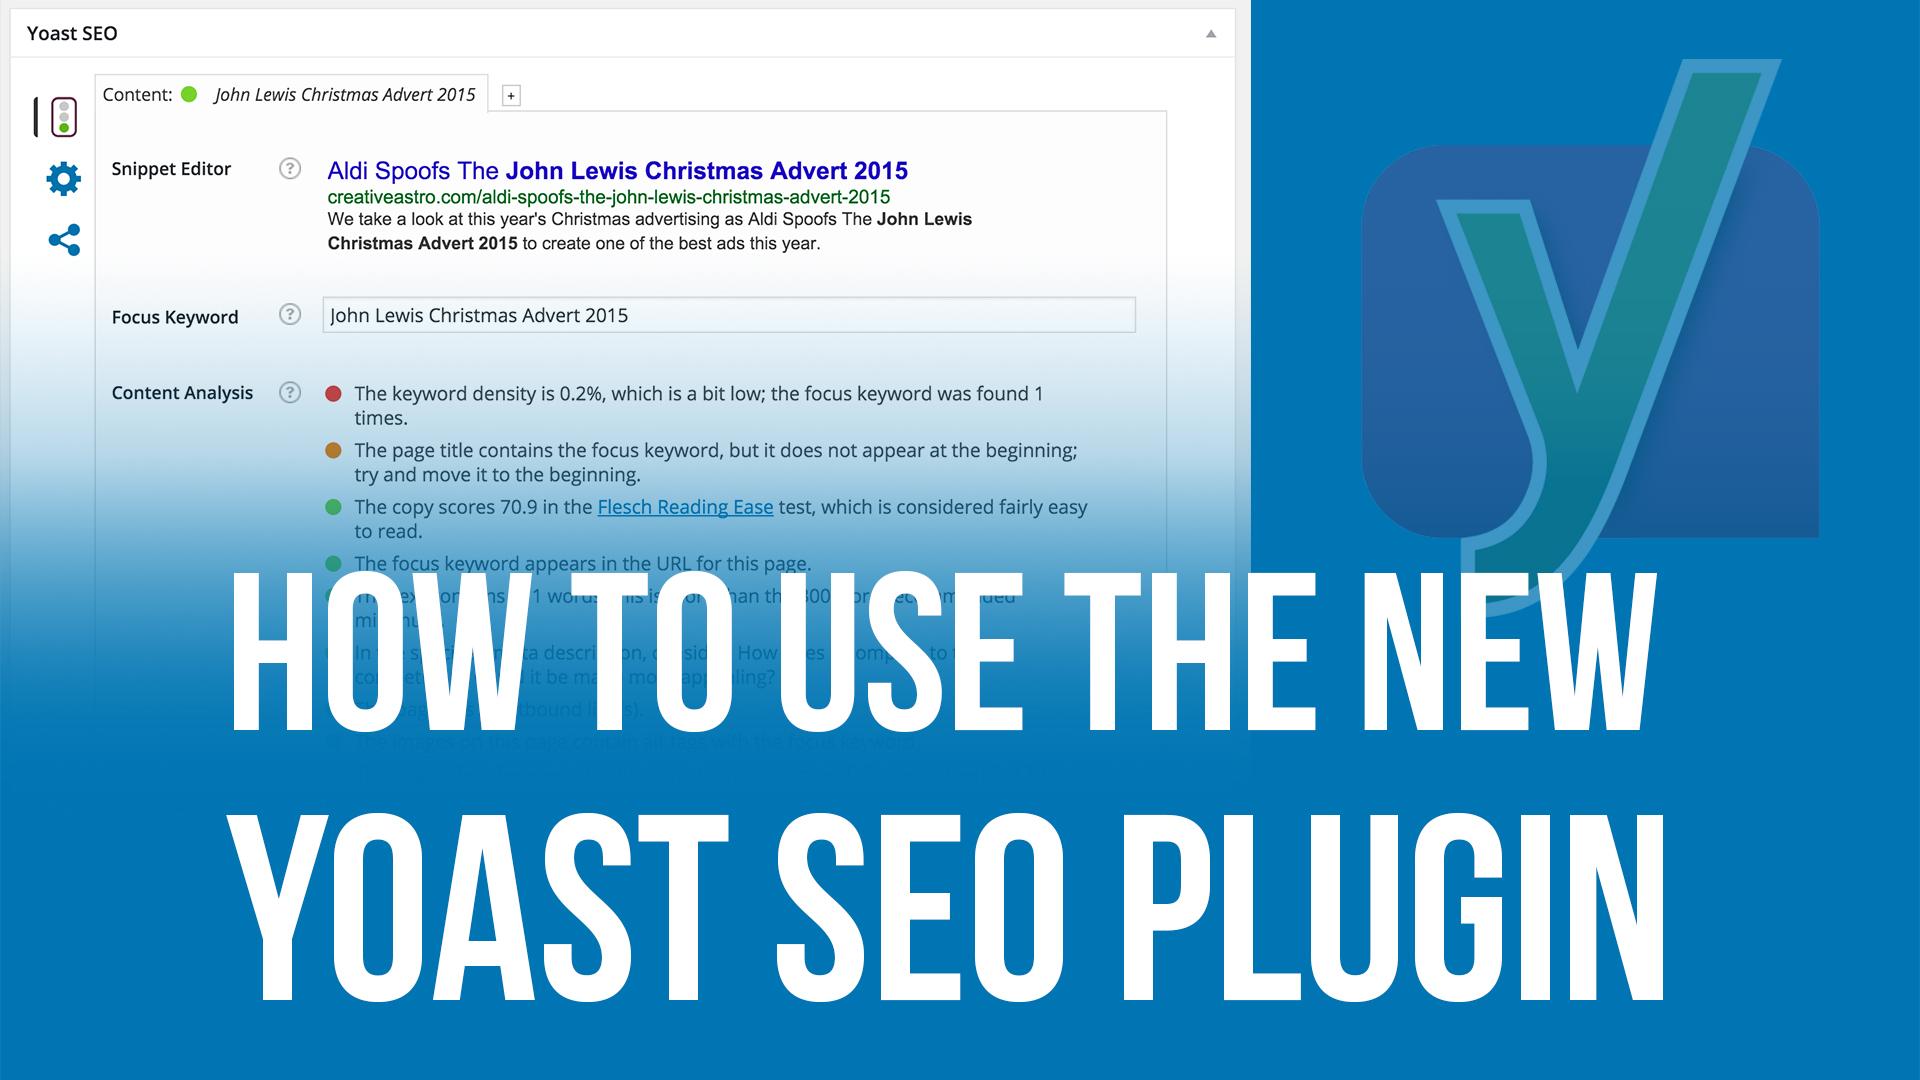 How to use the new yoast seo plugin